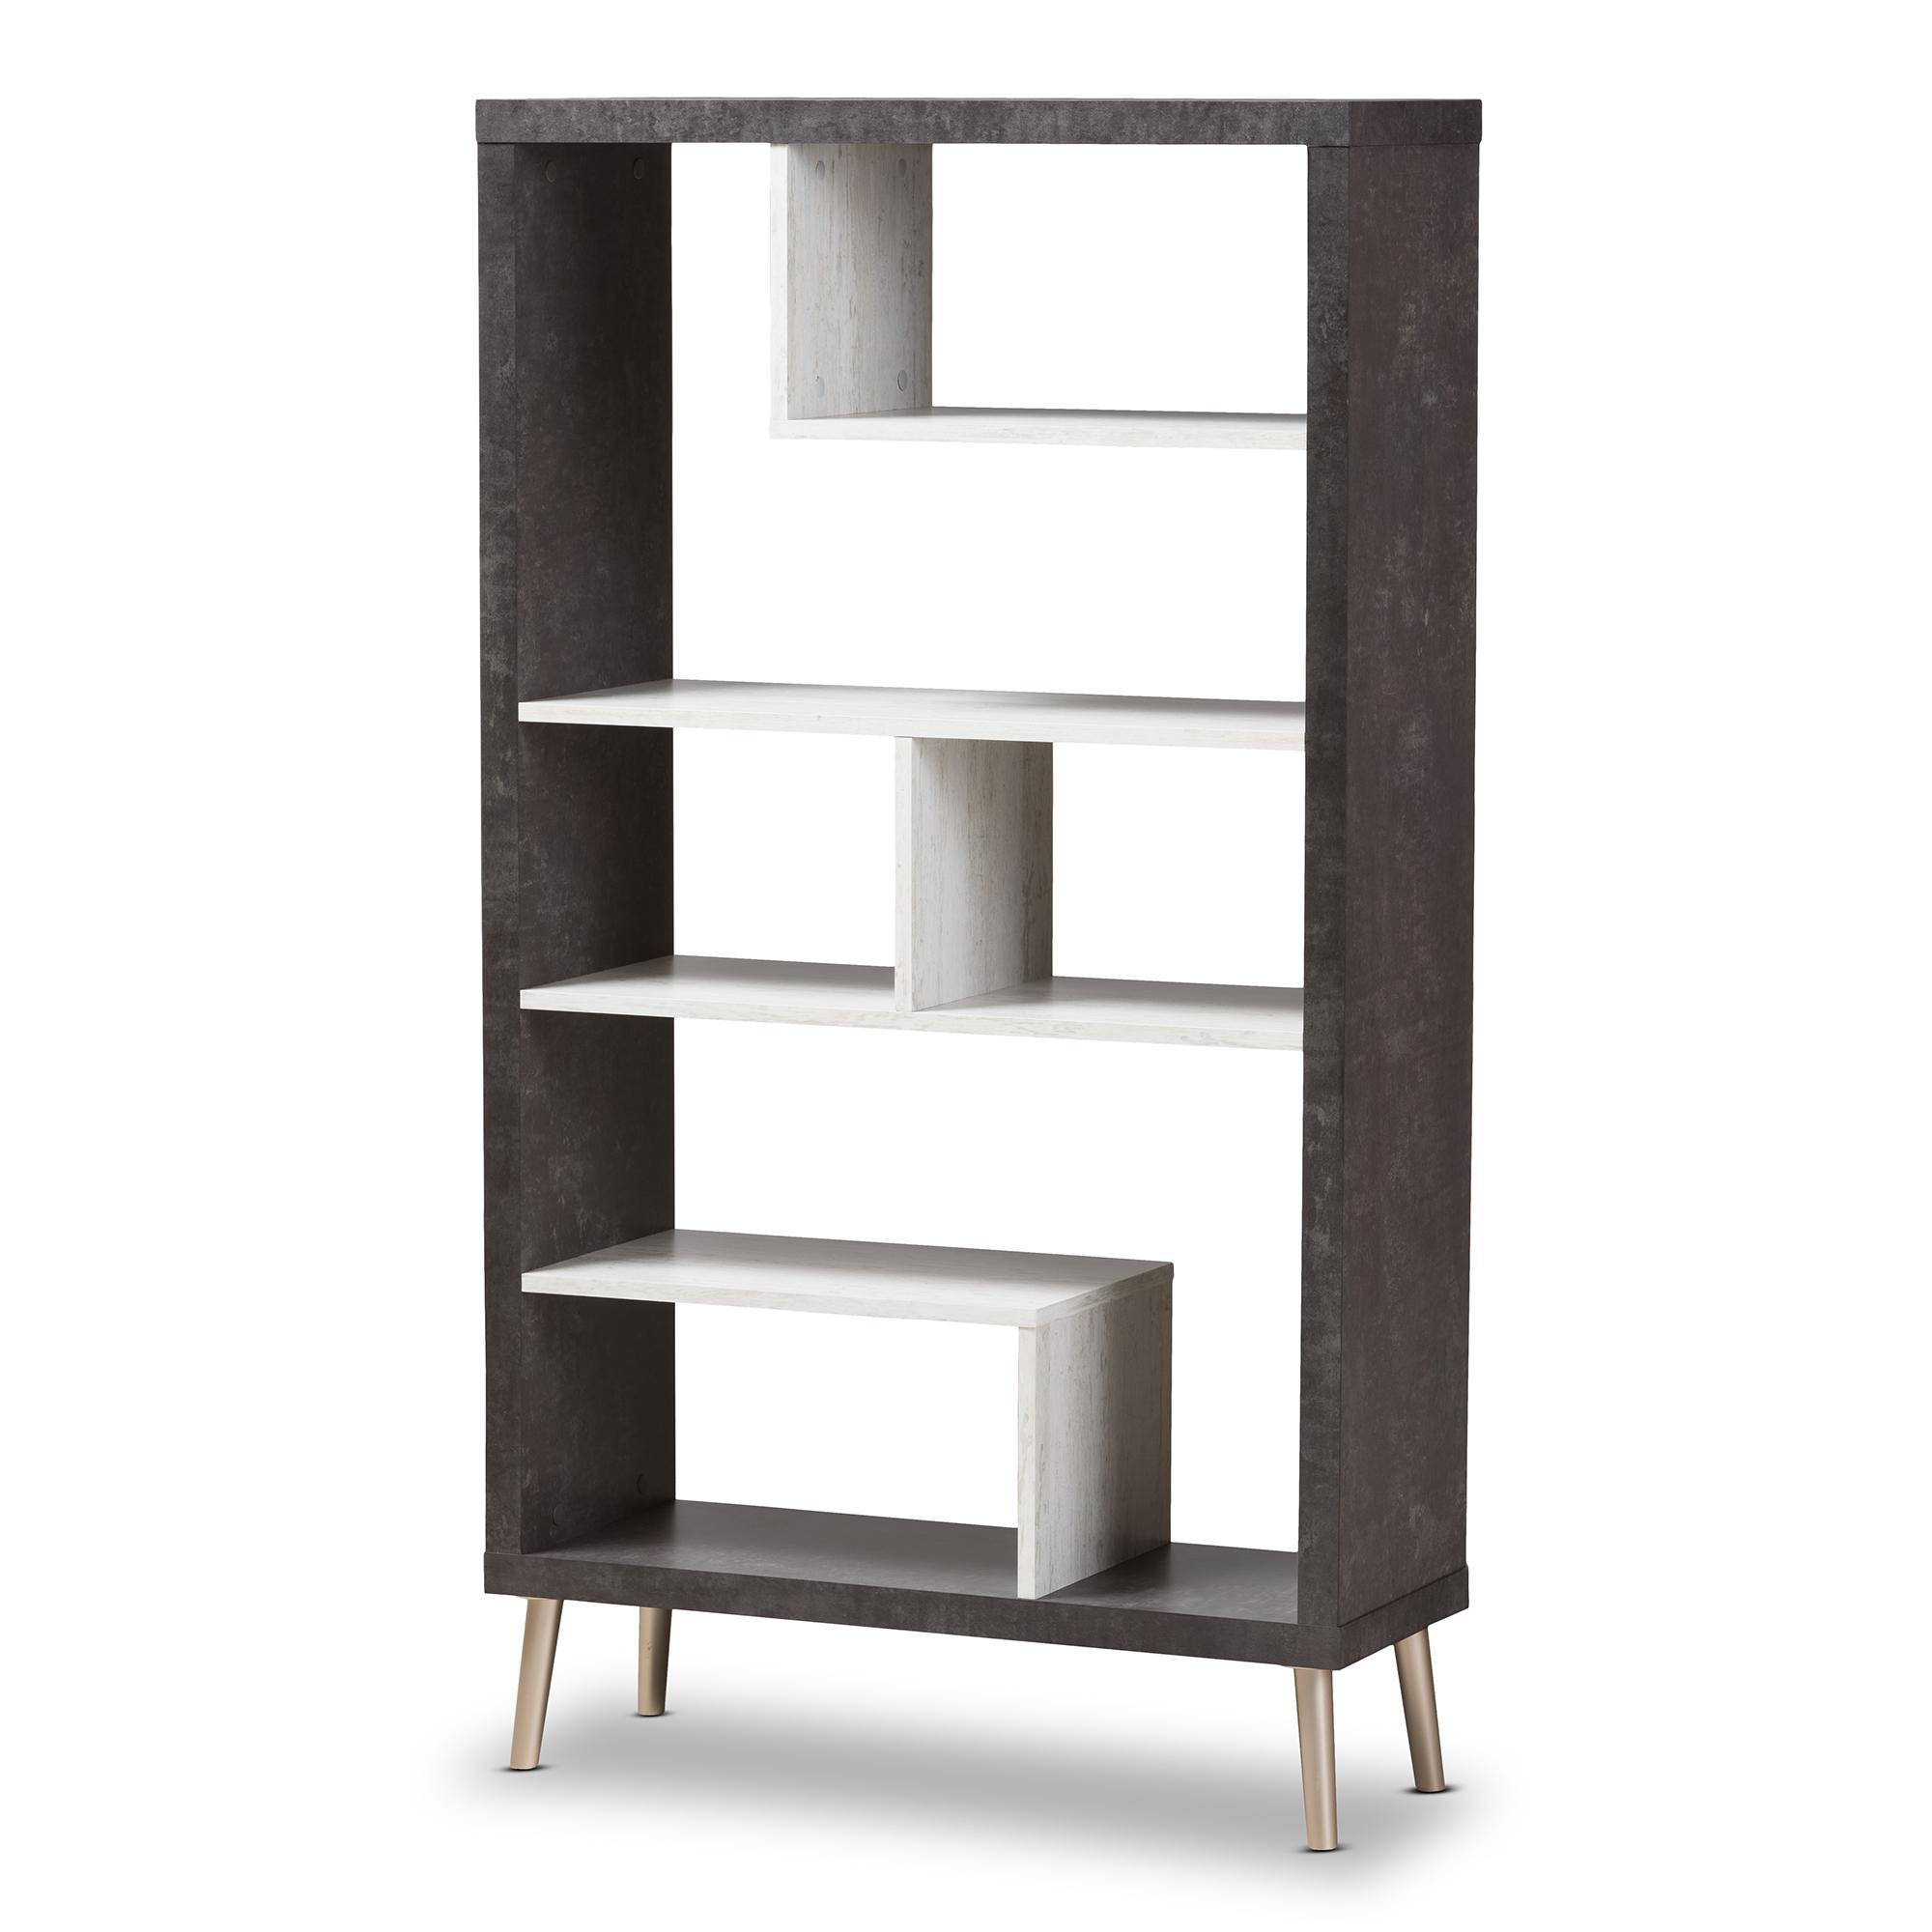 modern bookshelves furniture. Baxton Studio Atlantic Modern And Contemporary Dark Brown Light Grey Two-Tone Finished Wood Bookshelves Furniture A